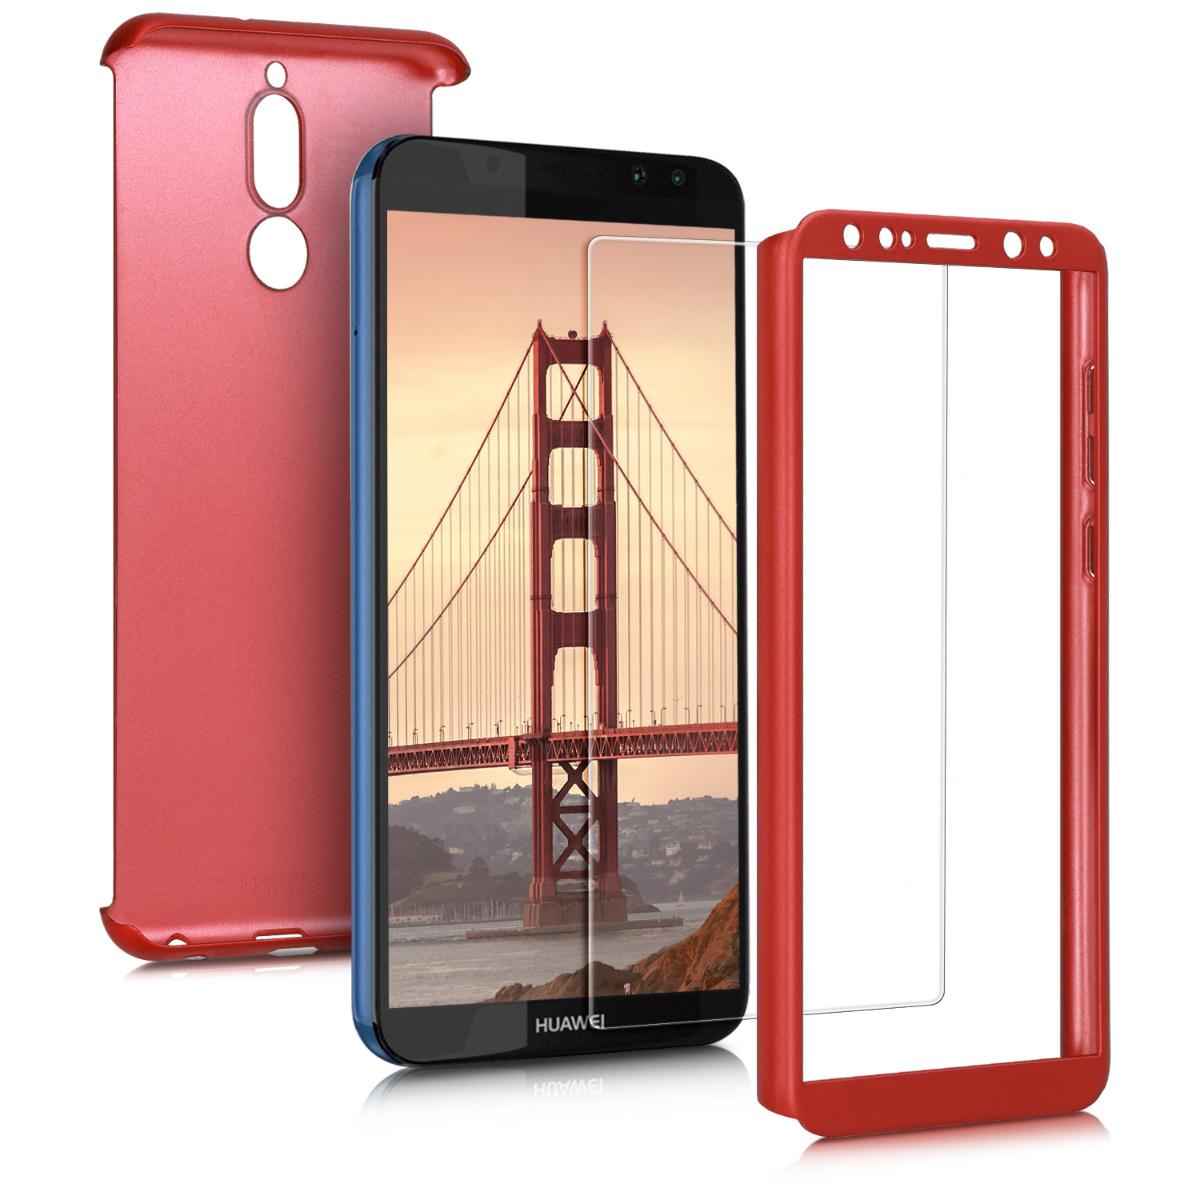 KW Θήκη Full Body Huawei Mate 10 Lite - Metallic Dark Red (46385.36)